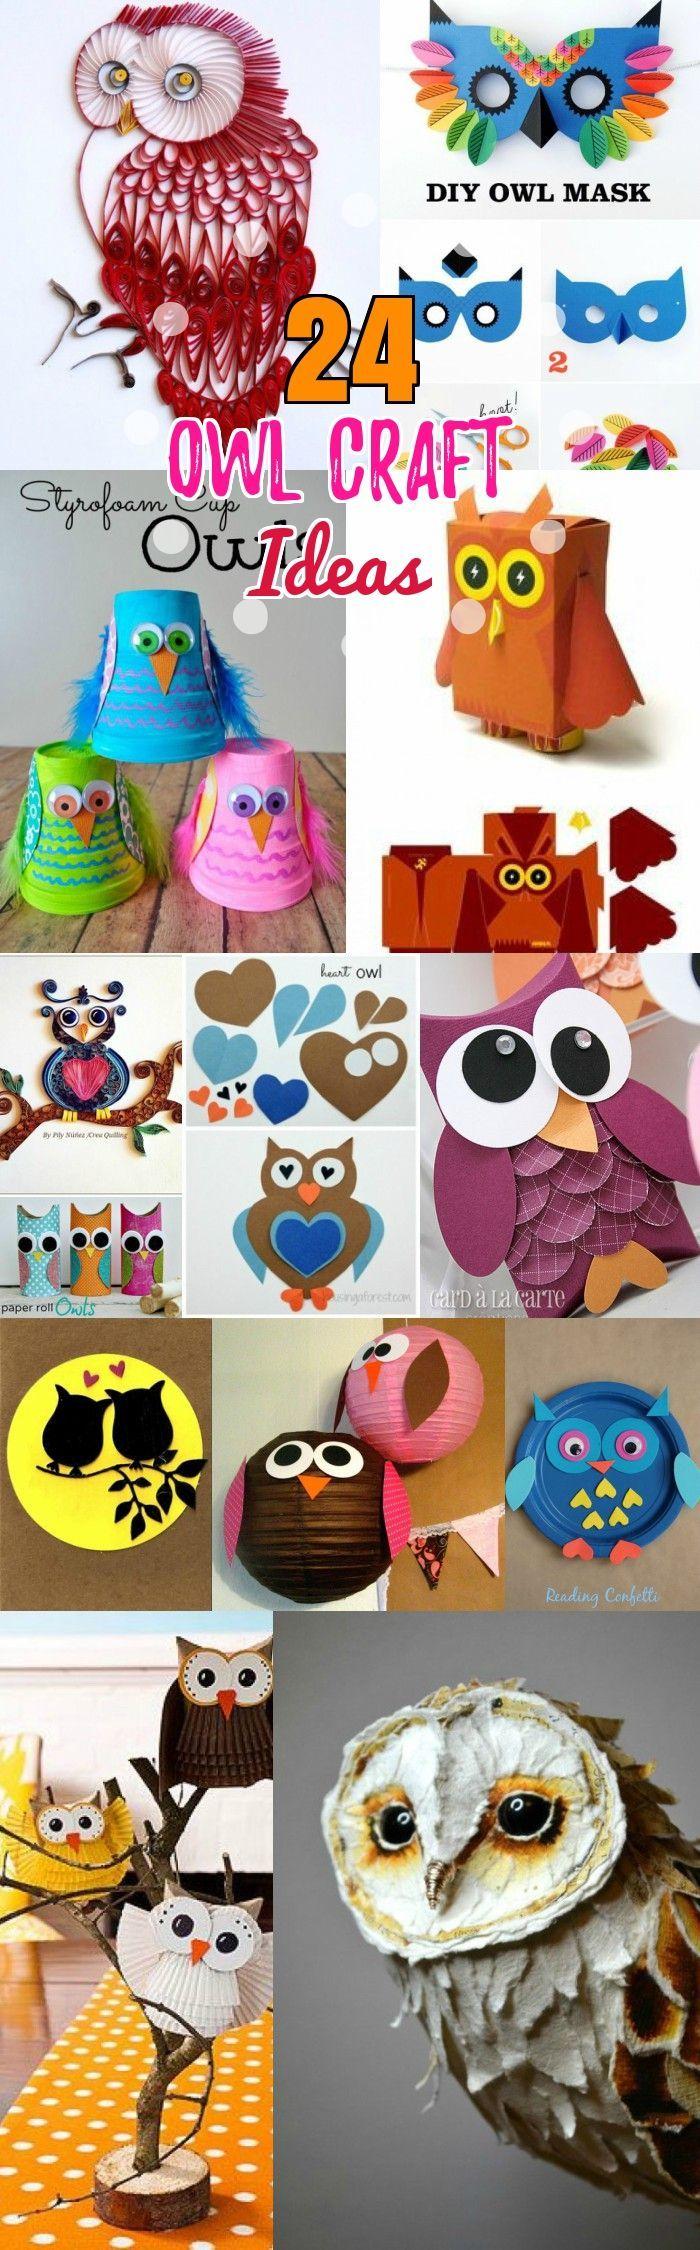 Diy birds craft 24 easy paper owl craft ideas for kids diy animal diy birds craft 24 easy paper owl craft ideas for kids diy animal birds solutioingenieria Gallery